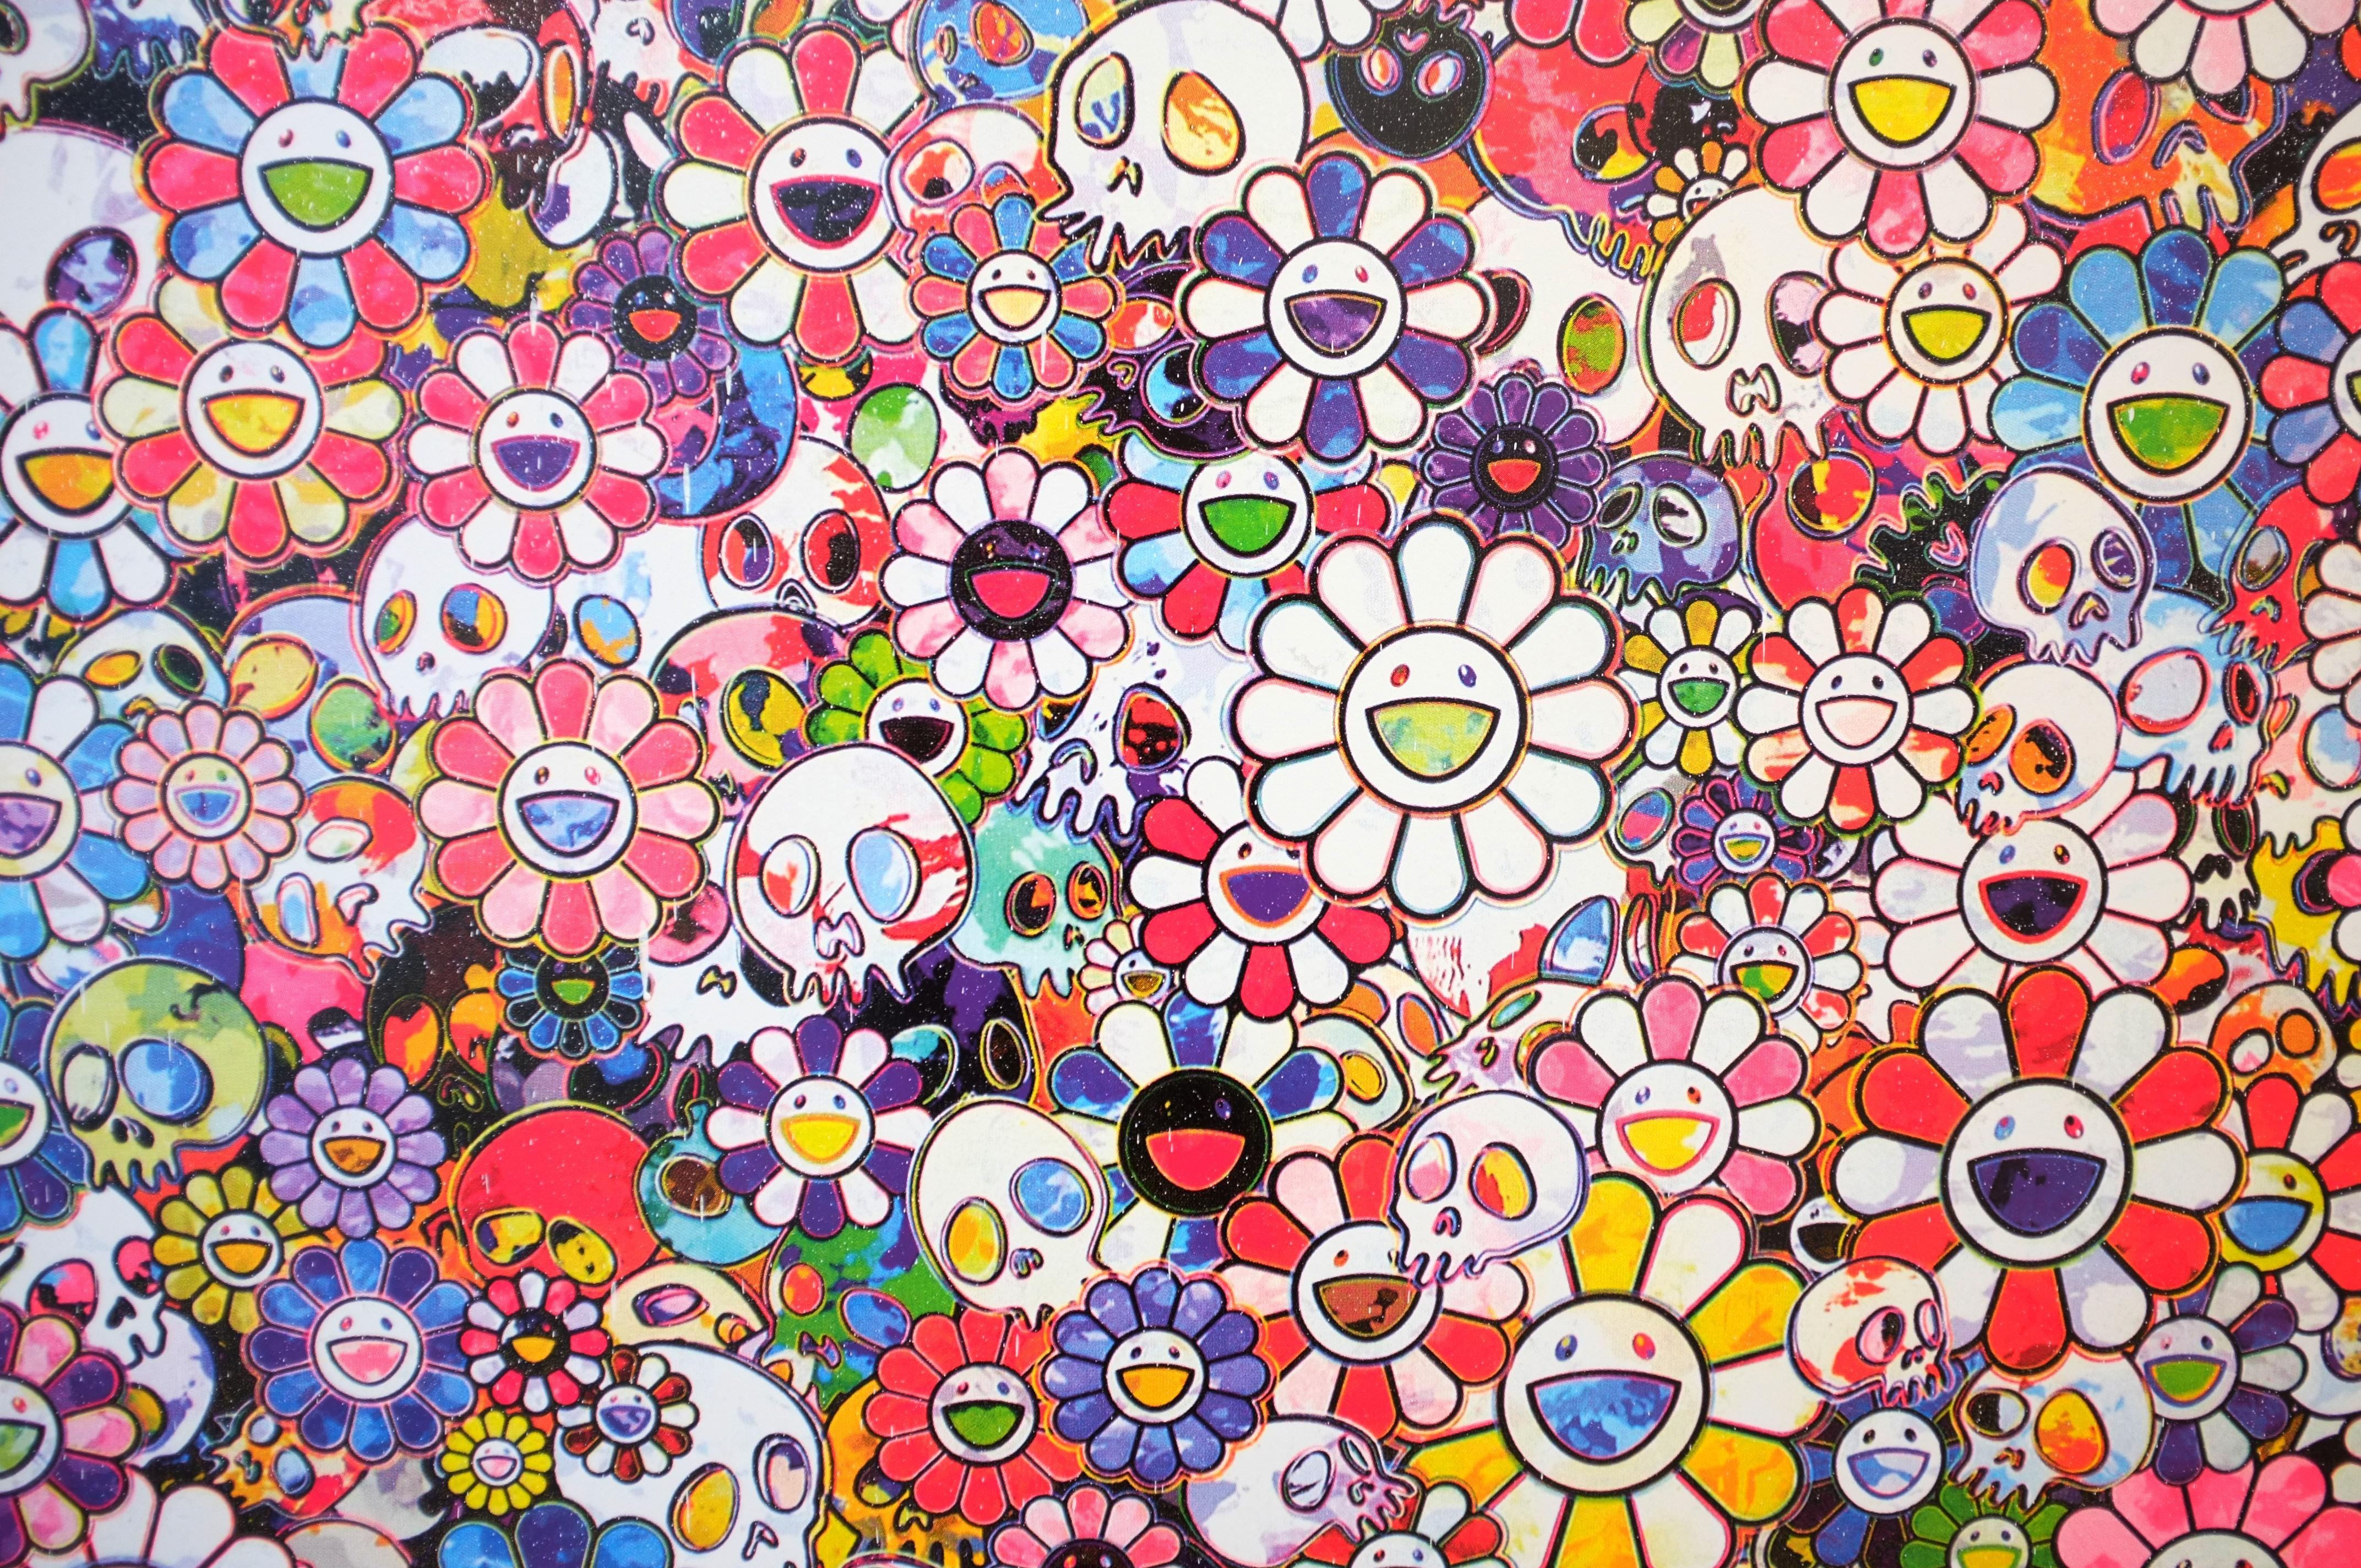 Takashi Murakami - Flowers and Skulls | jerrylore.com | 4288 x 2848 jpeg 3837kB